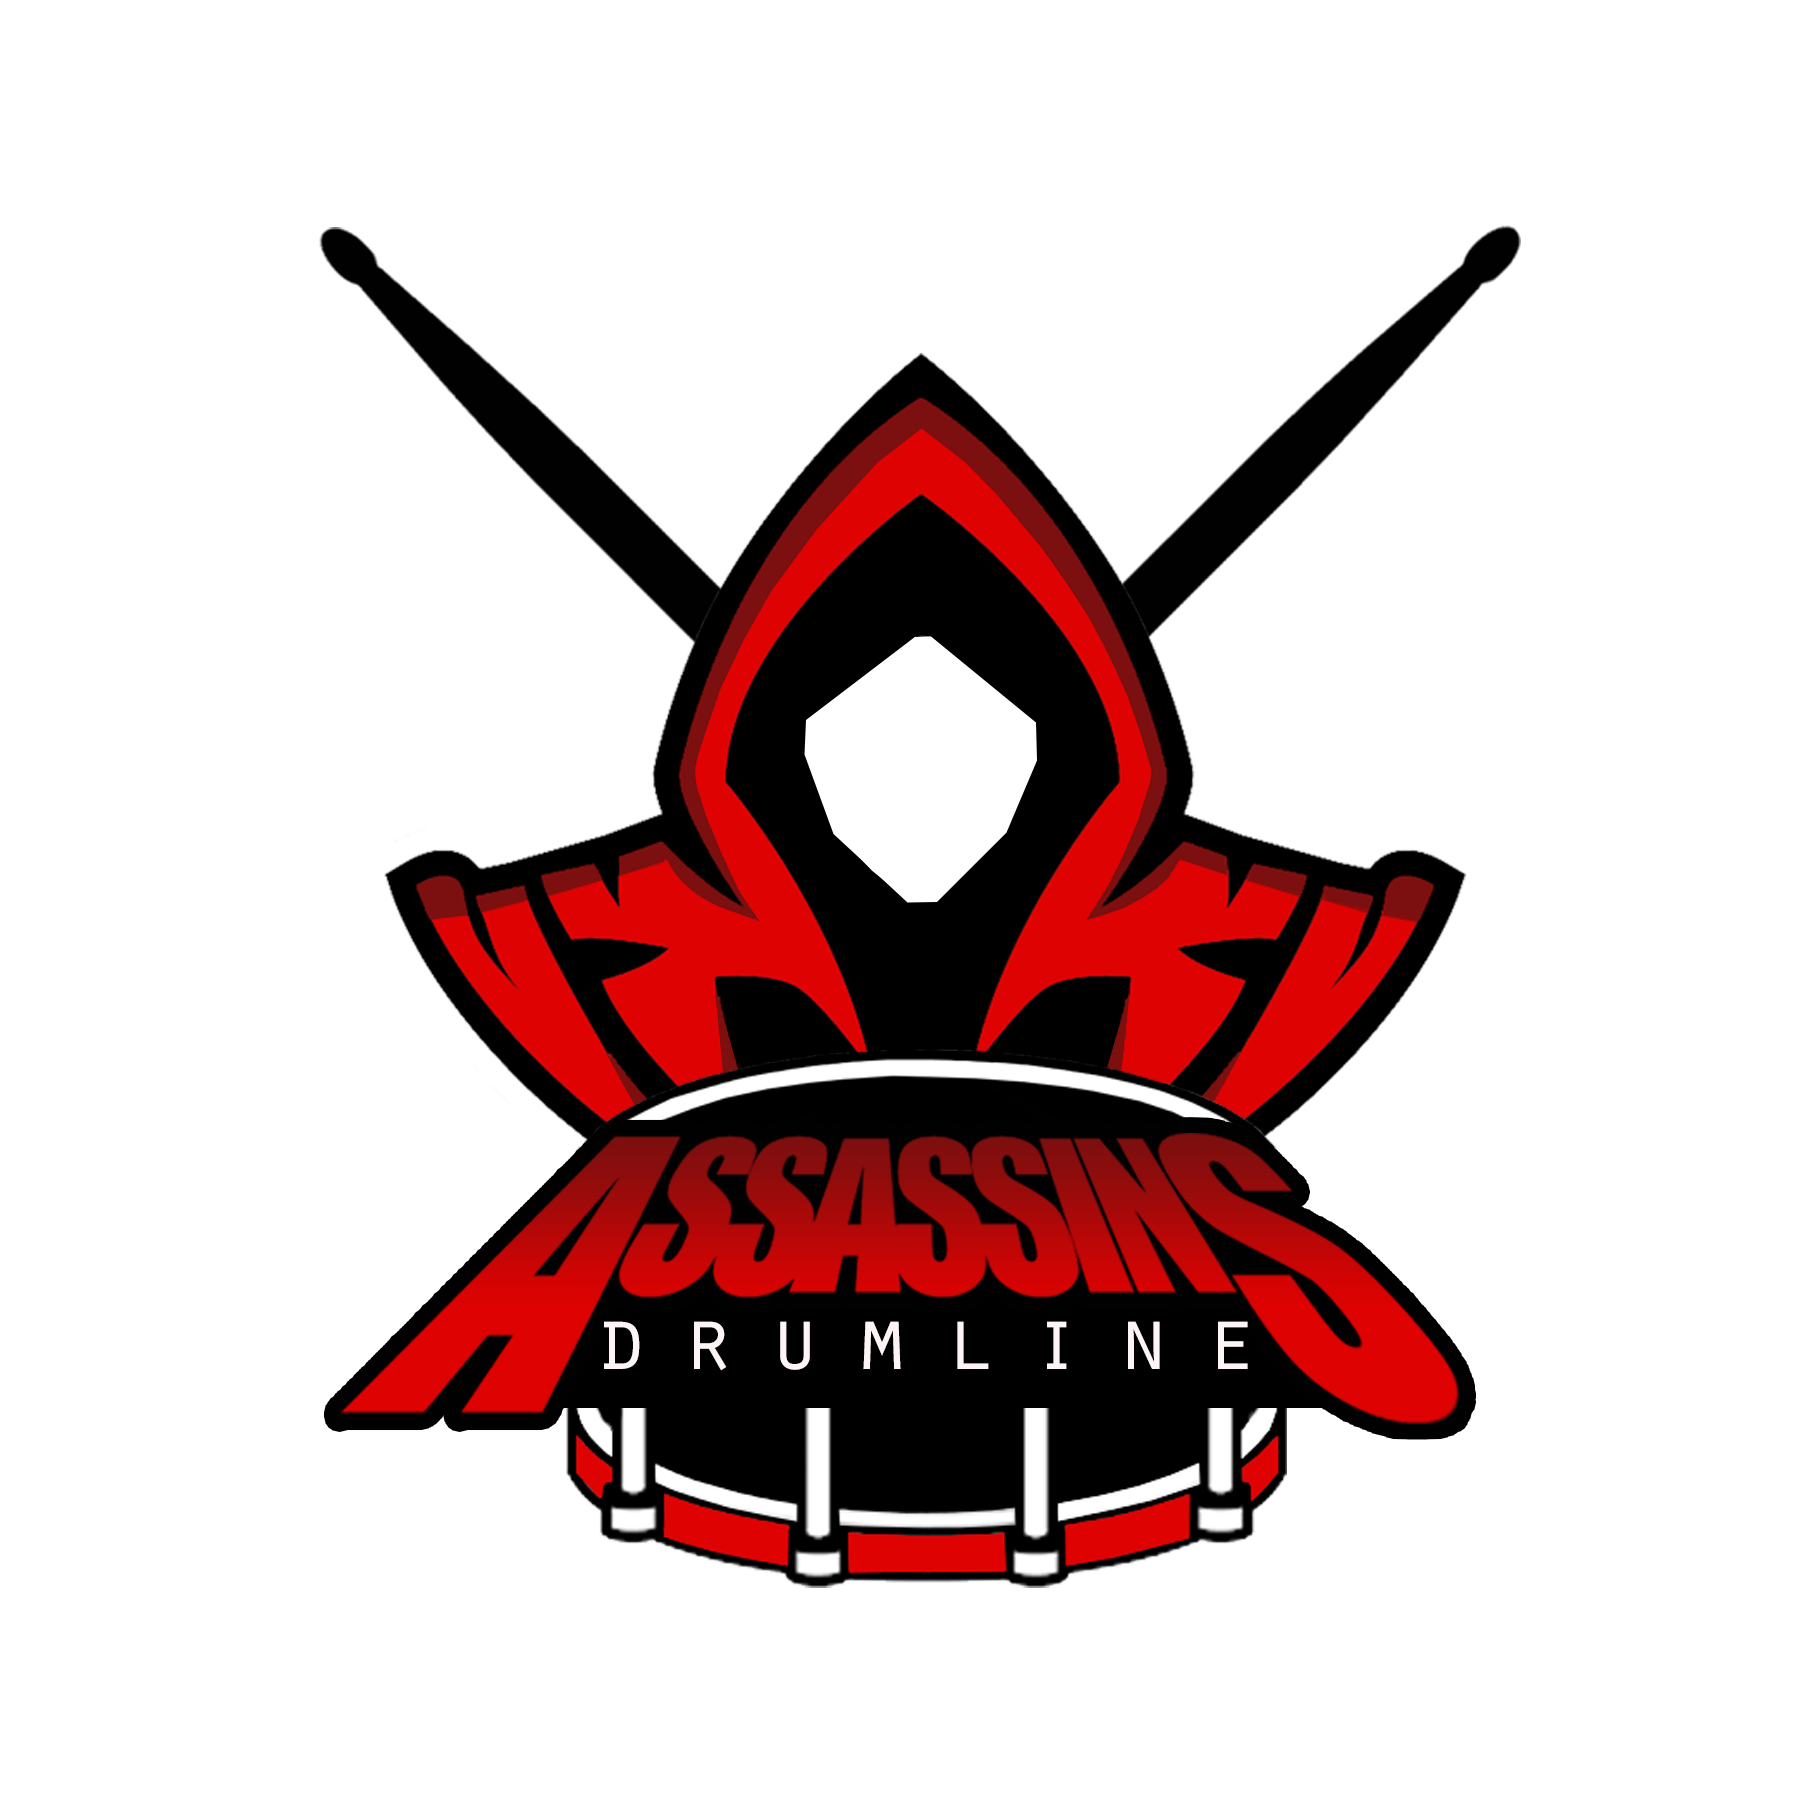 Assassins Drumline transparent.png